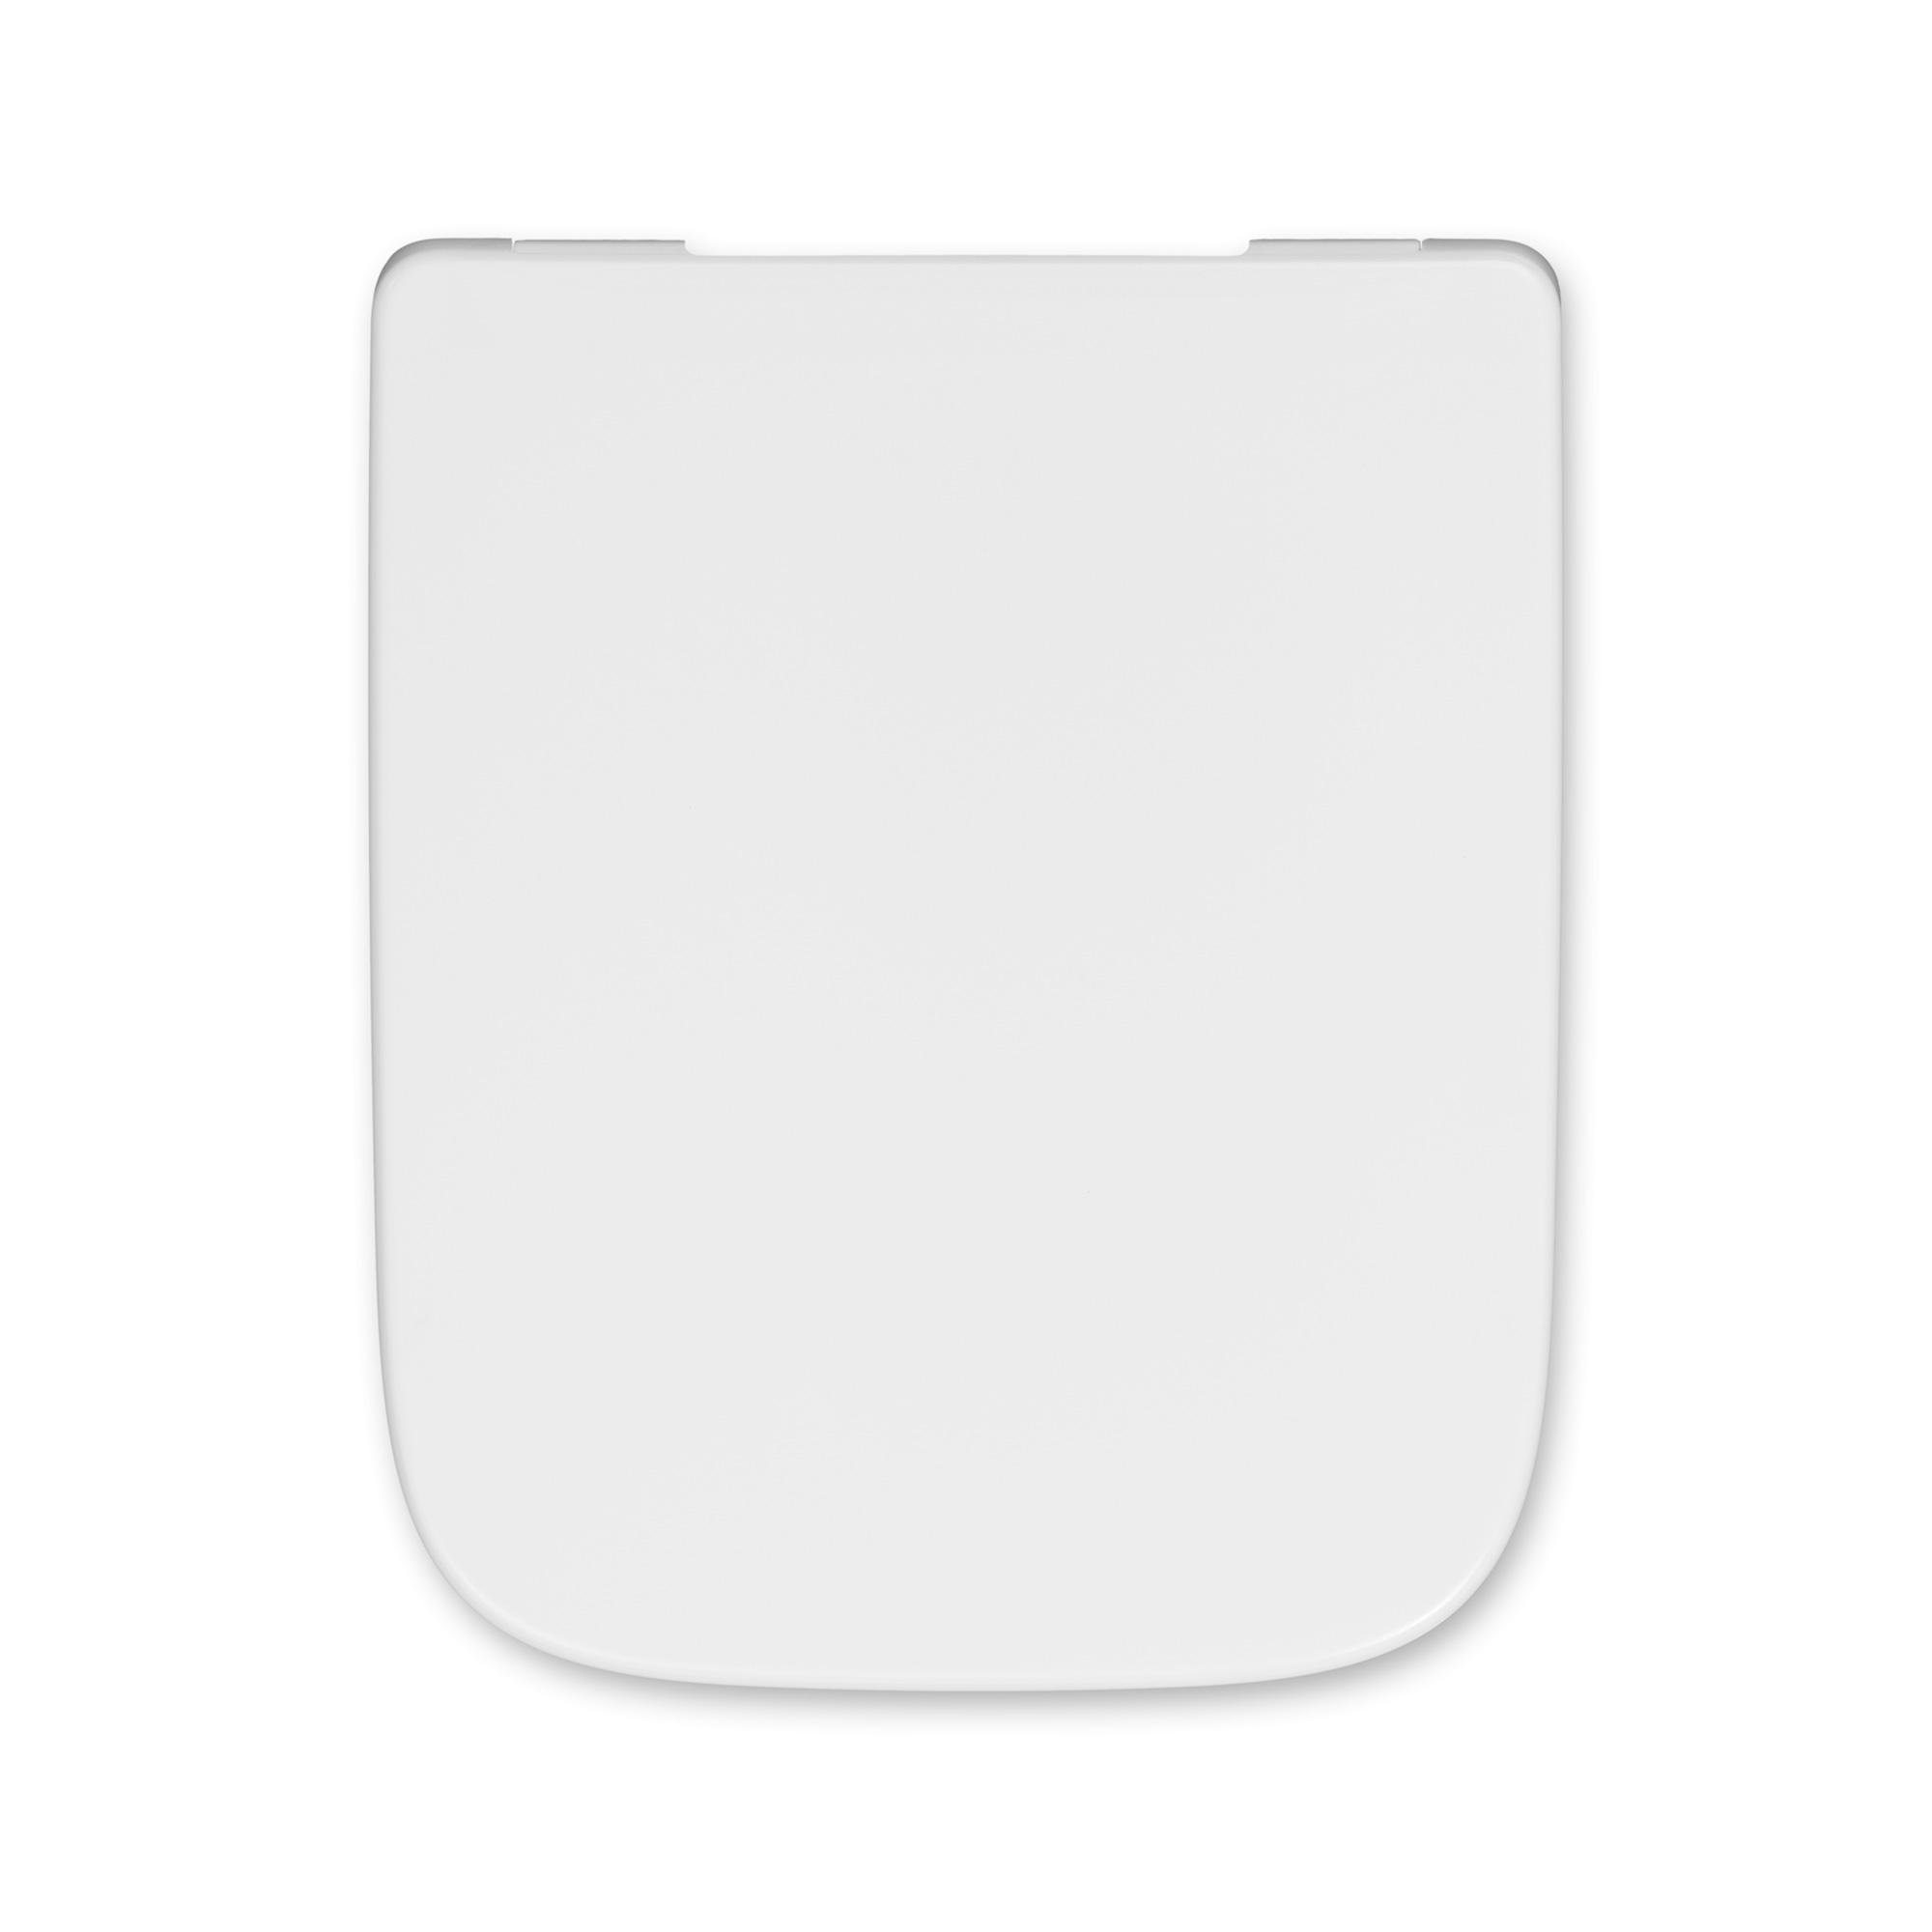 hamberger makira premium wc sitz 531555 reuter onlineshop. Black Bedroom Furniture Sets. Home Design Ideas